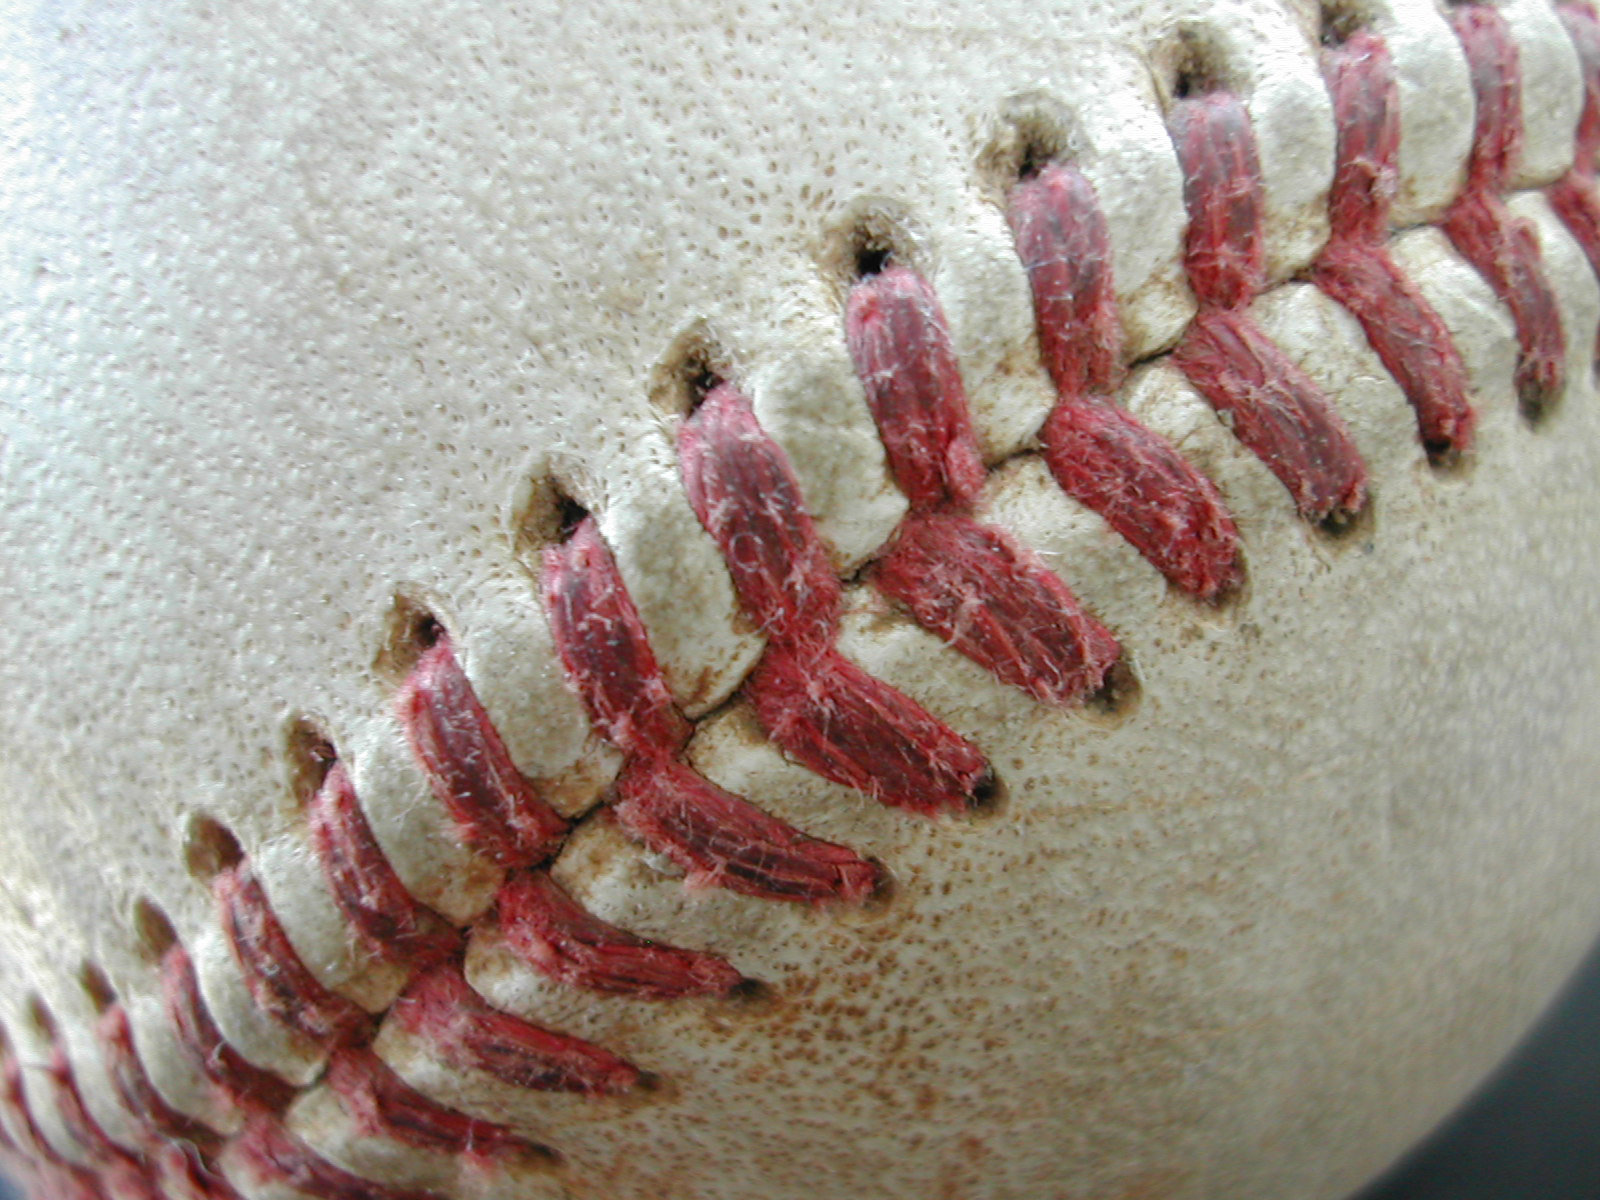 baseball sports texture fabrics seam leather objects mcmath